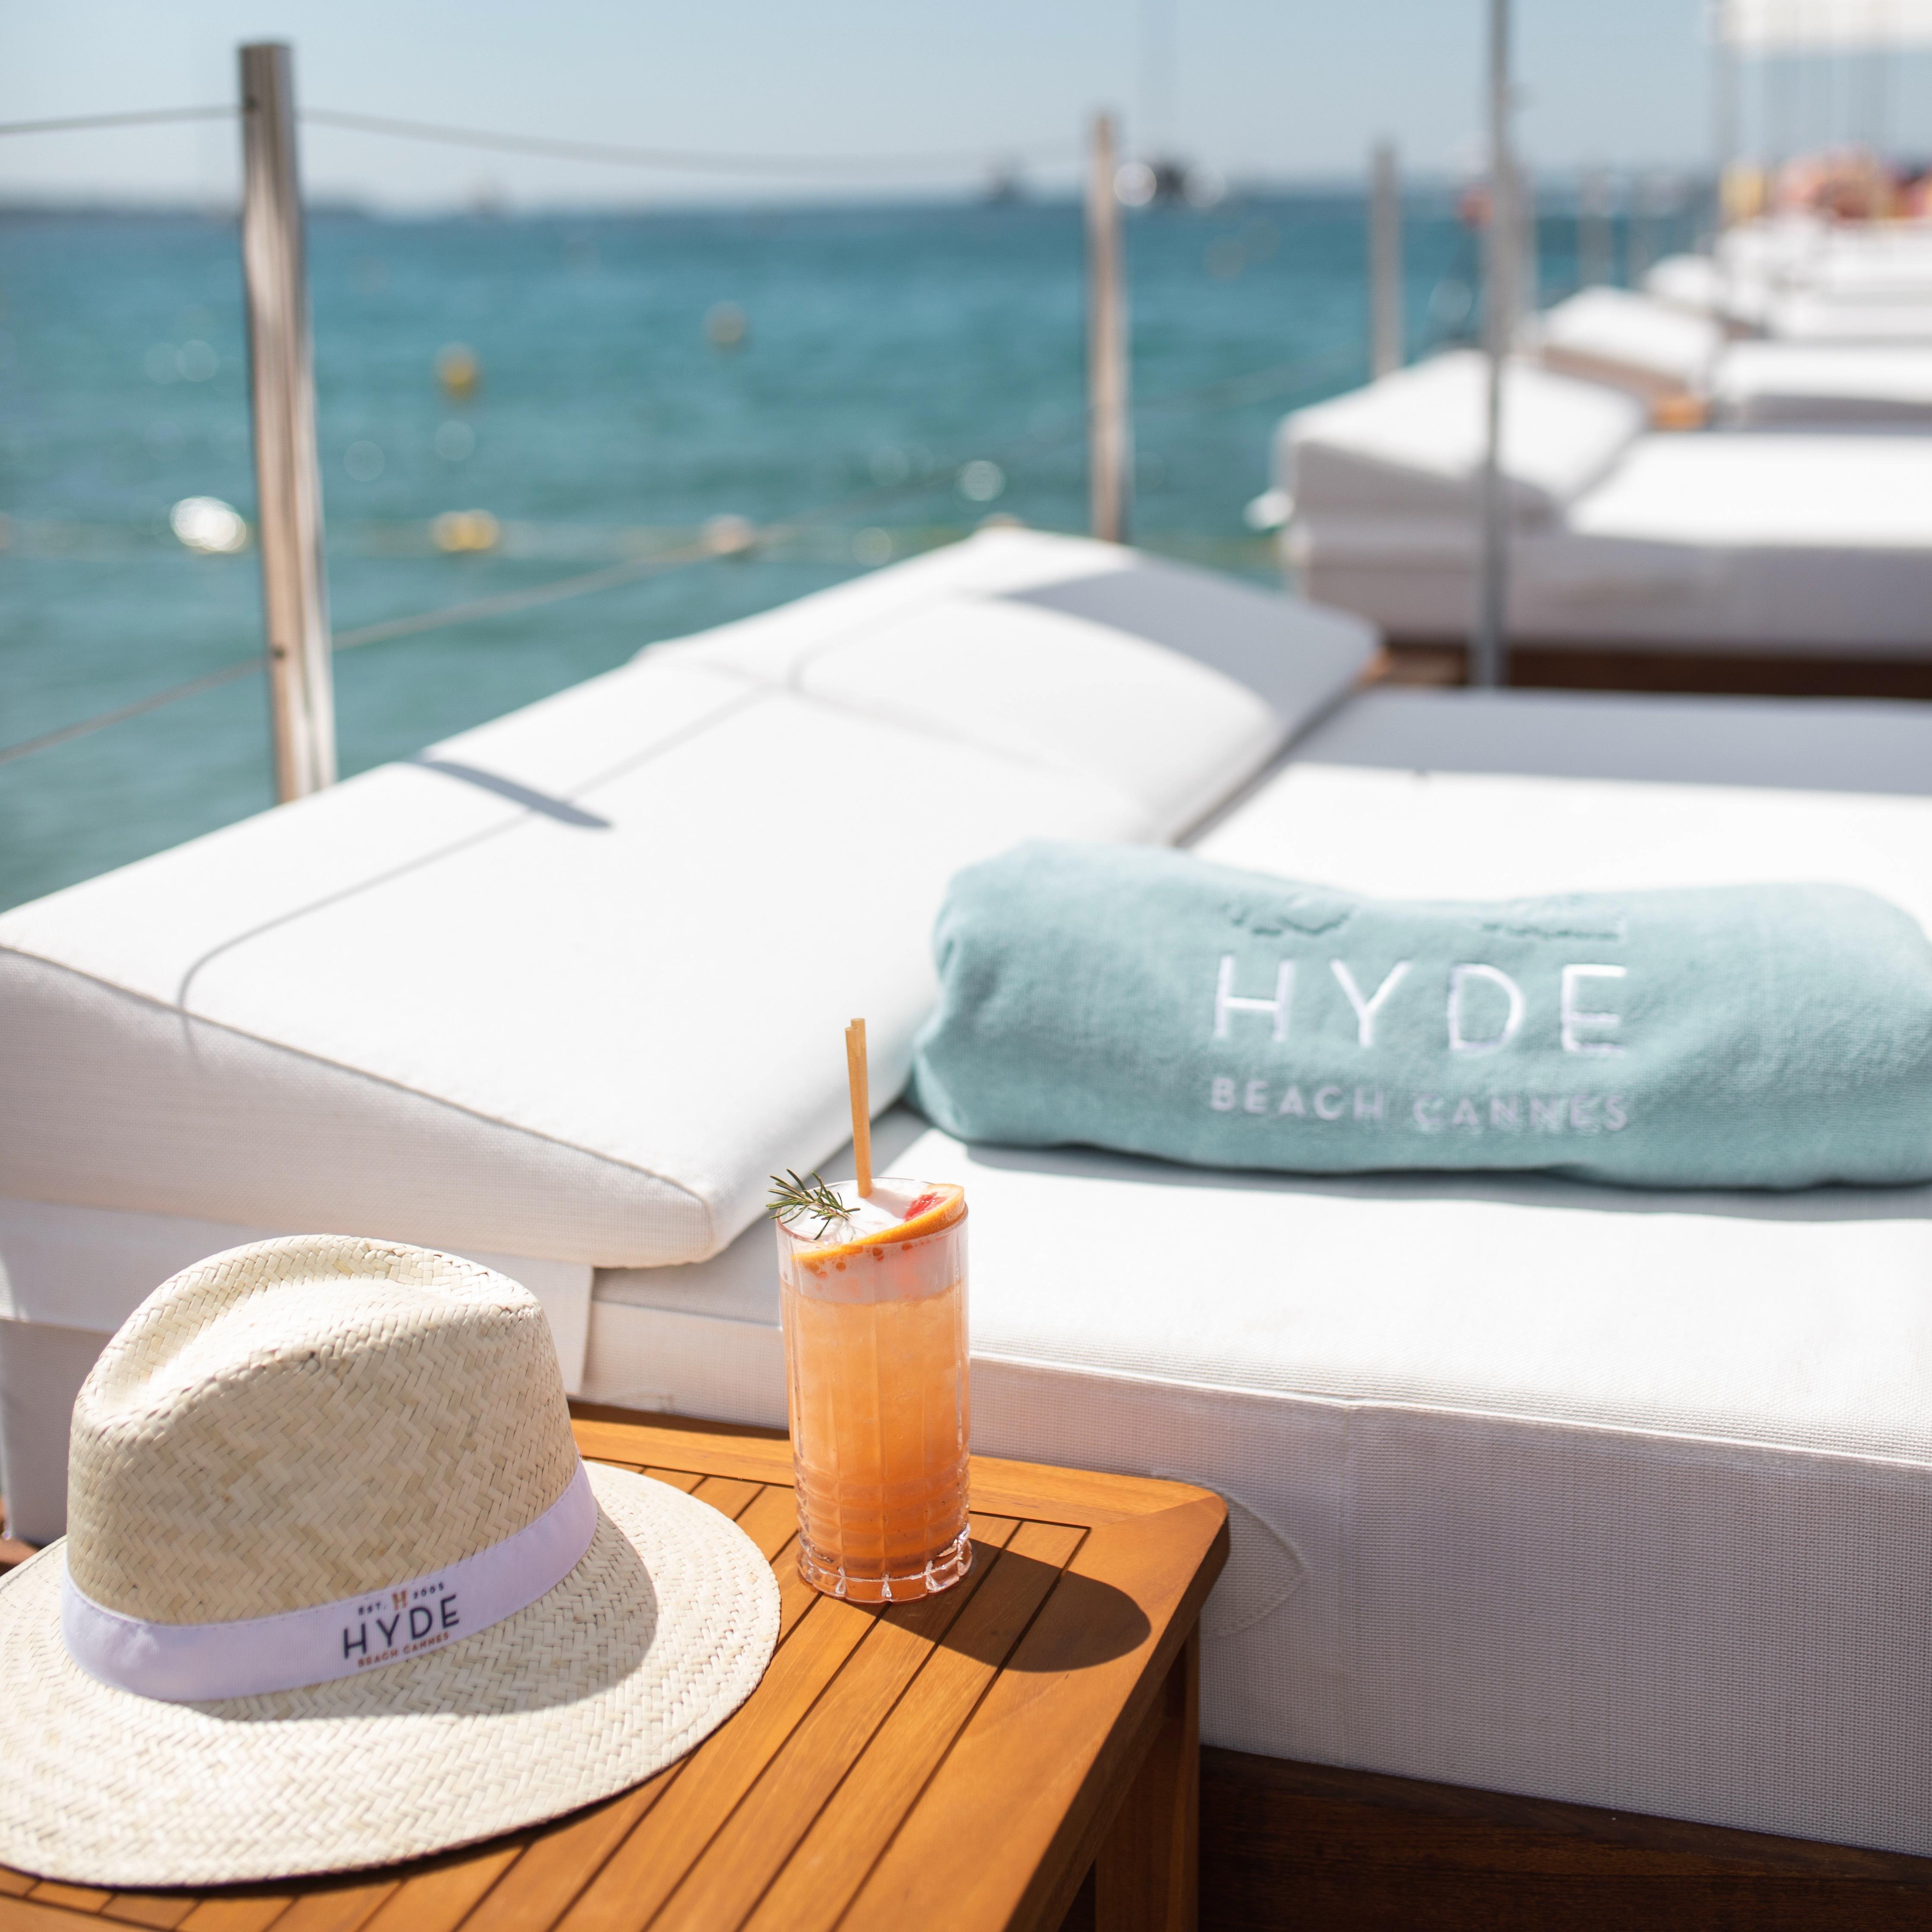 Grand Hotel Cannes - Бархатный сезон в Каннах